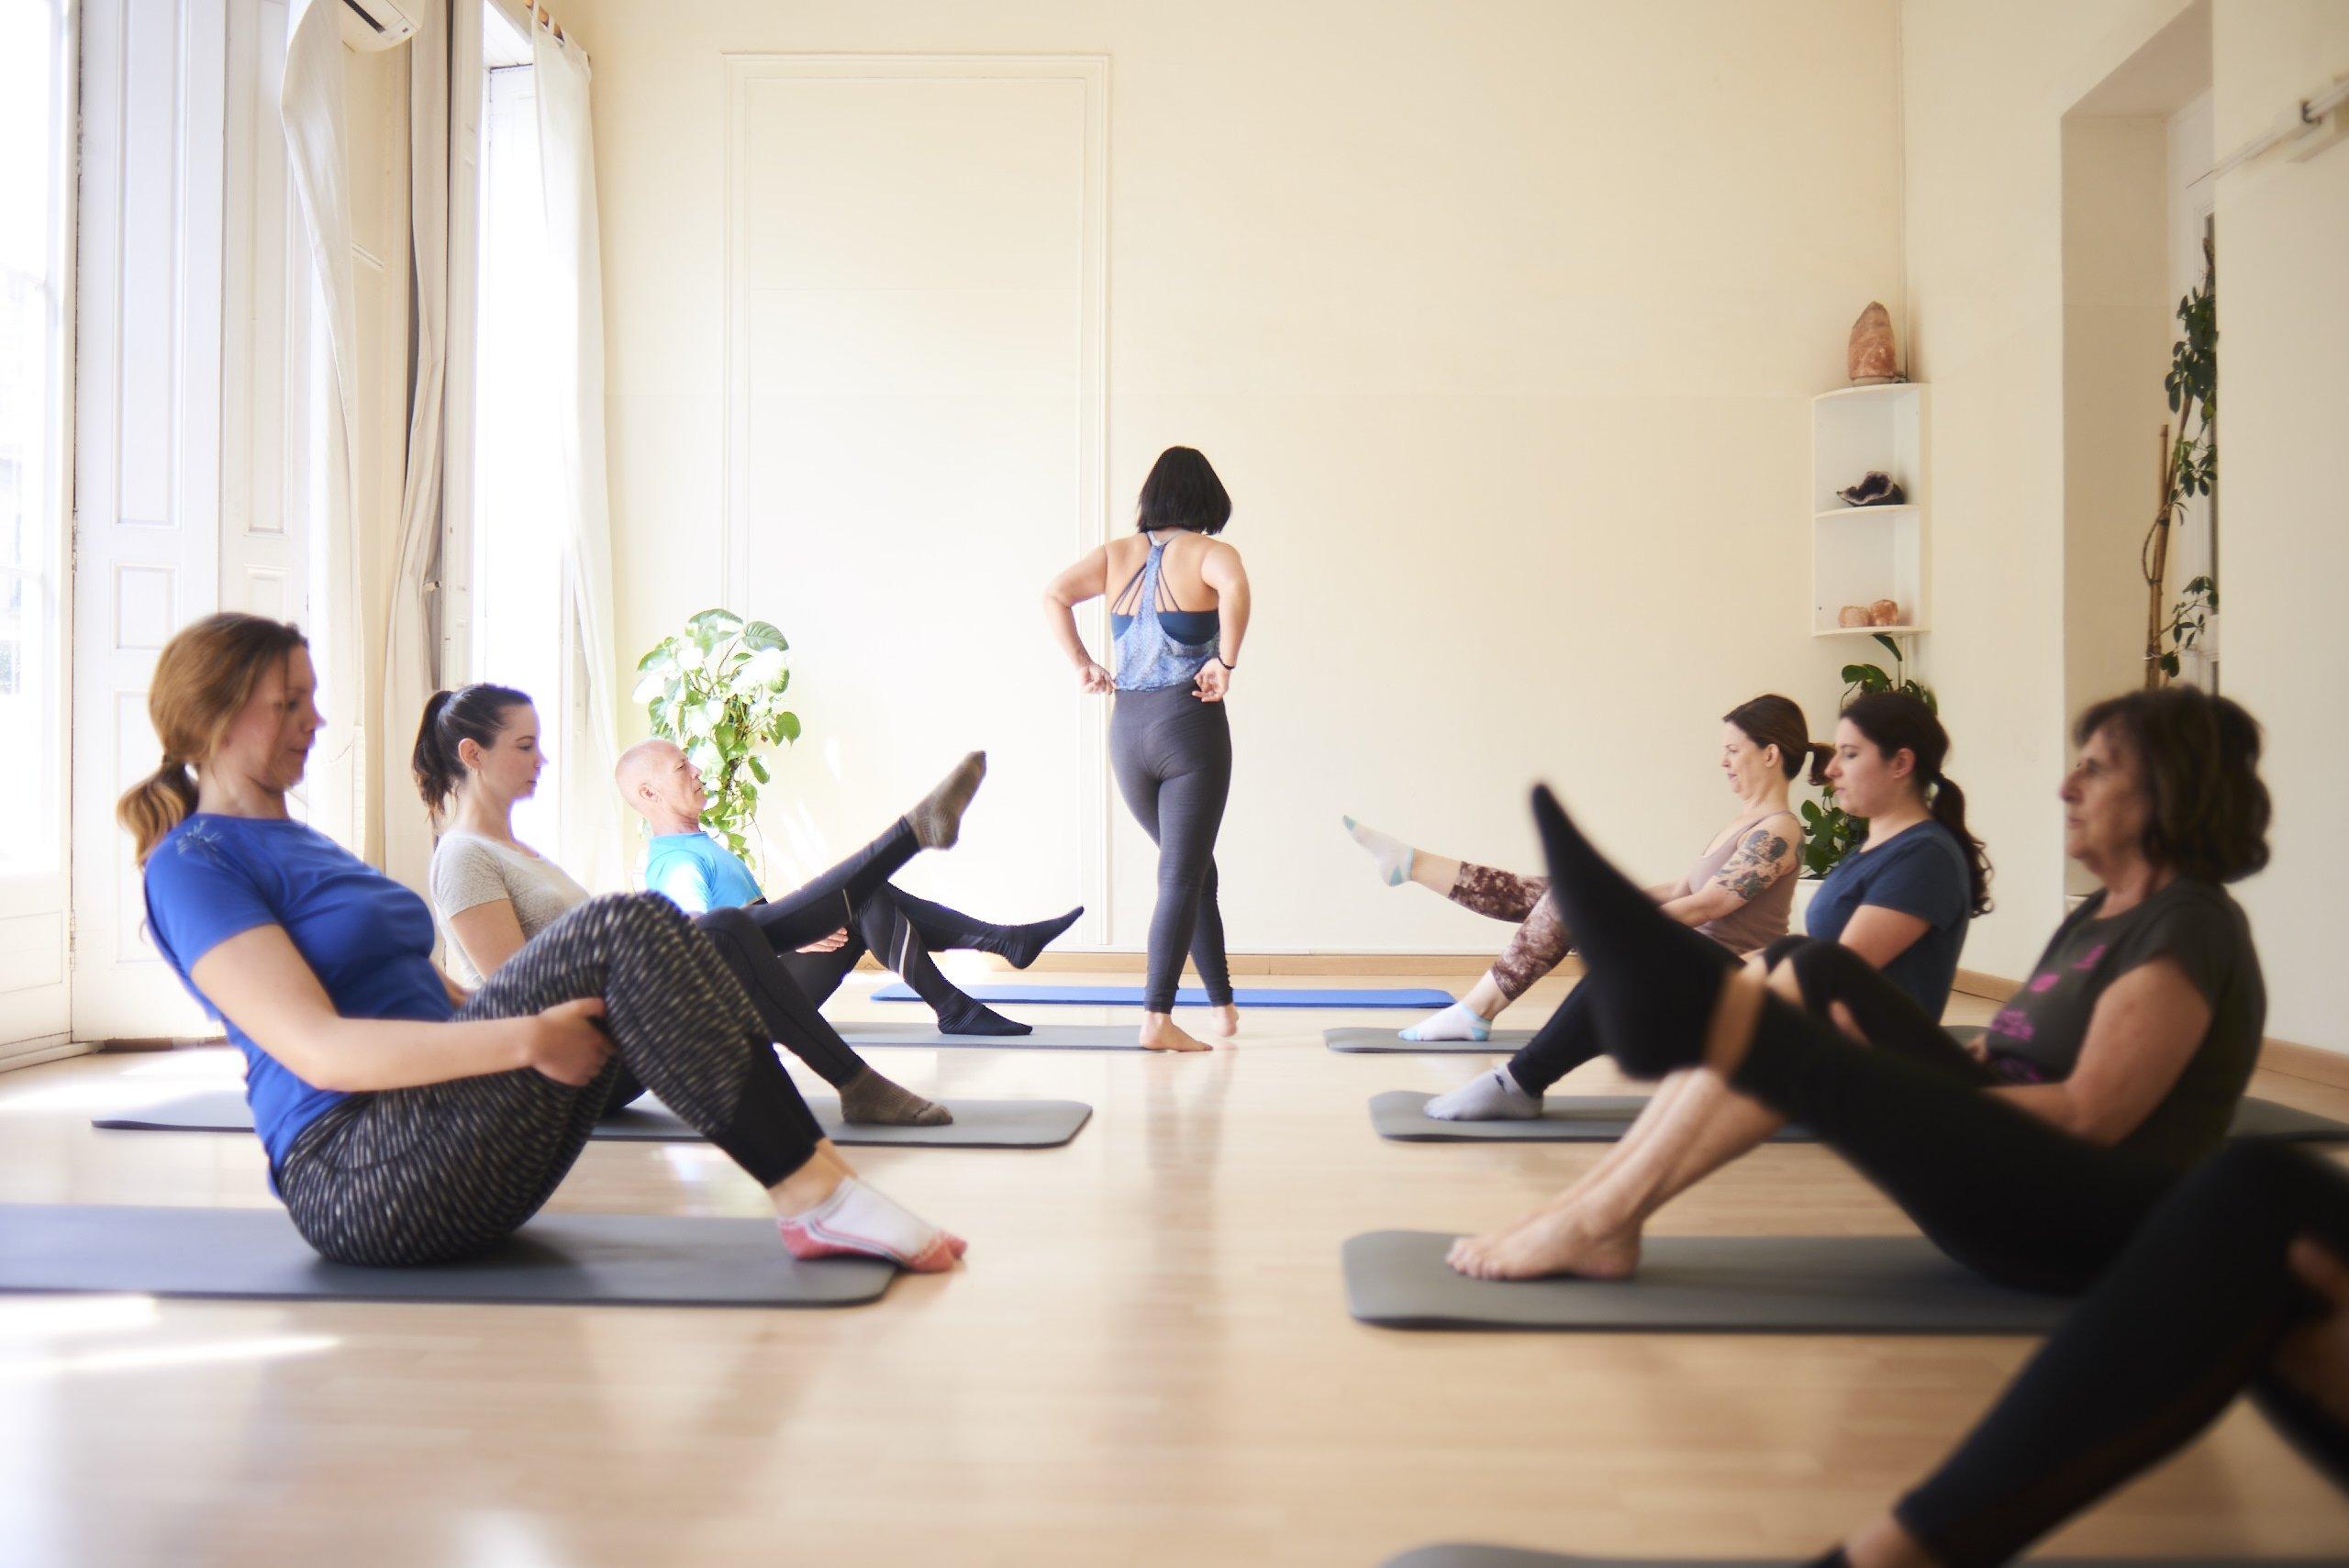 Pilate's abdominal exercises for pregnancy